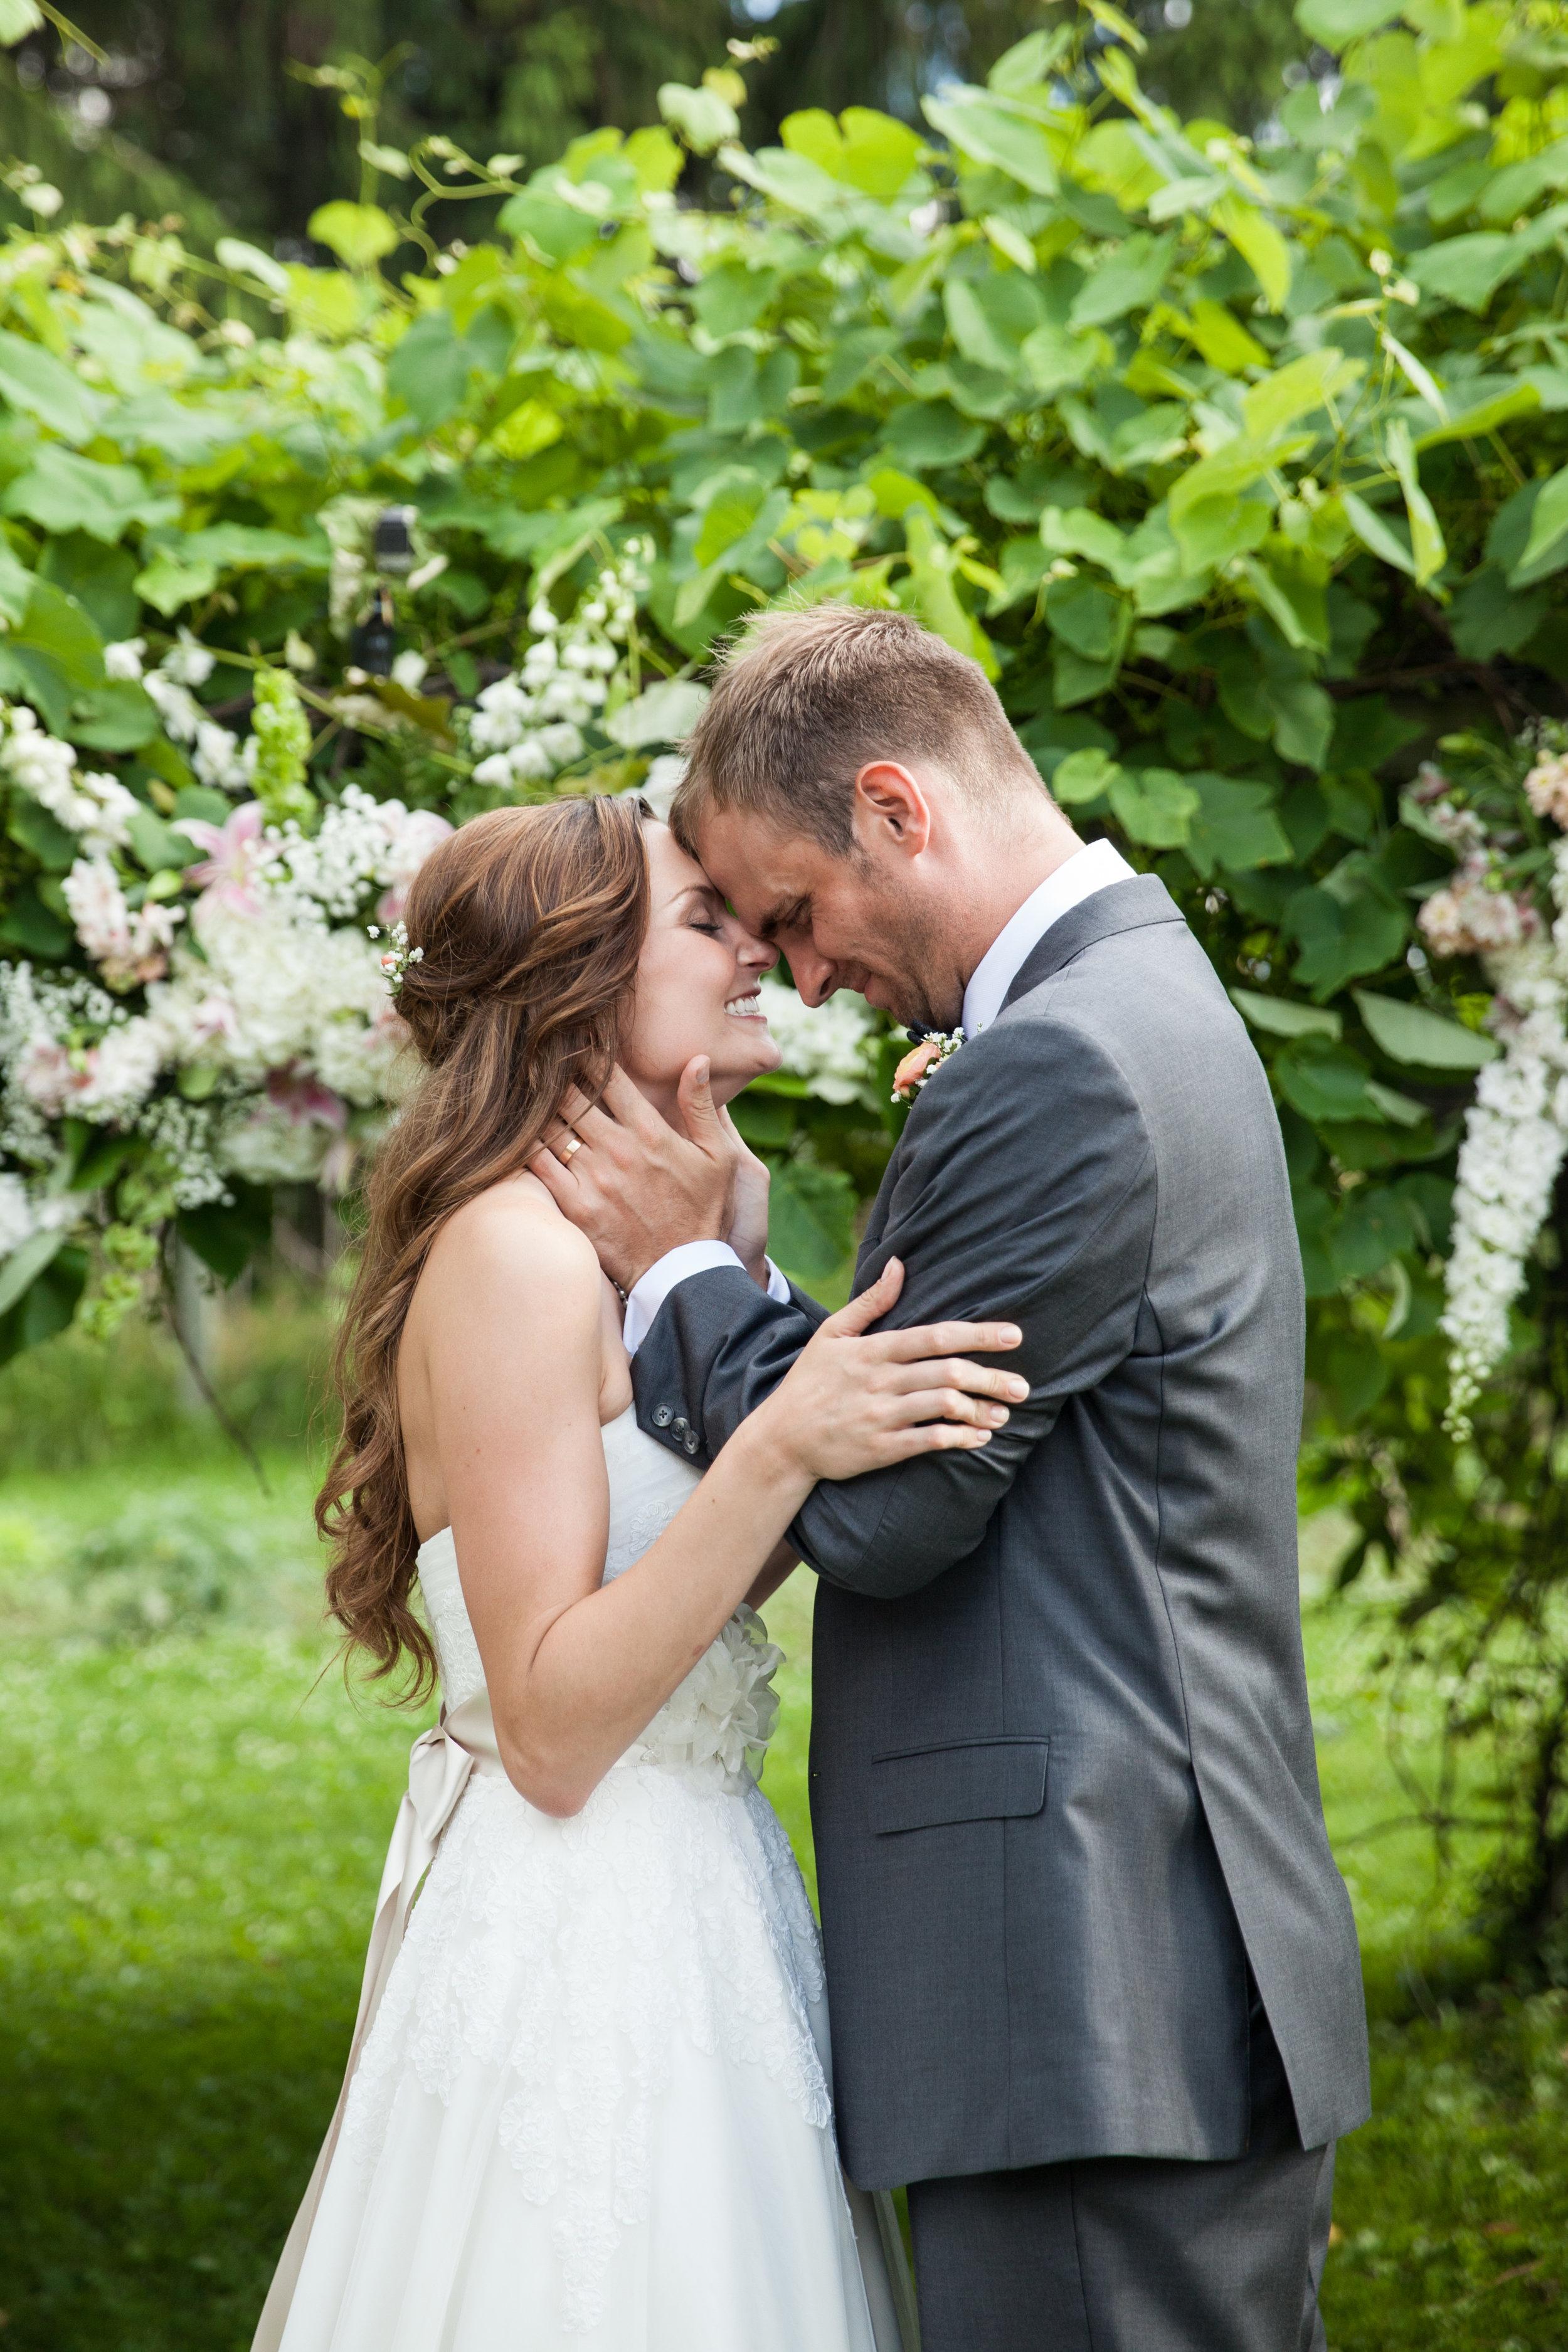 LisaDiederichPhotography_Sarah&Patrick_Blog-27.jpg